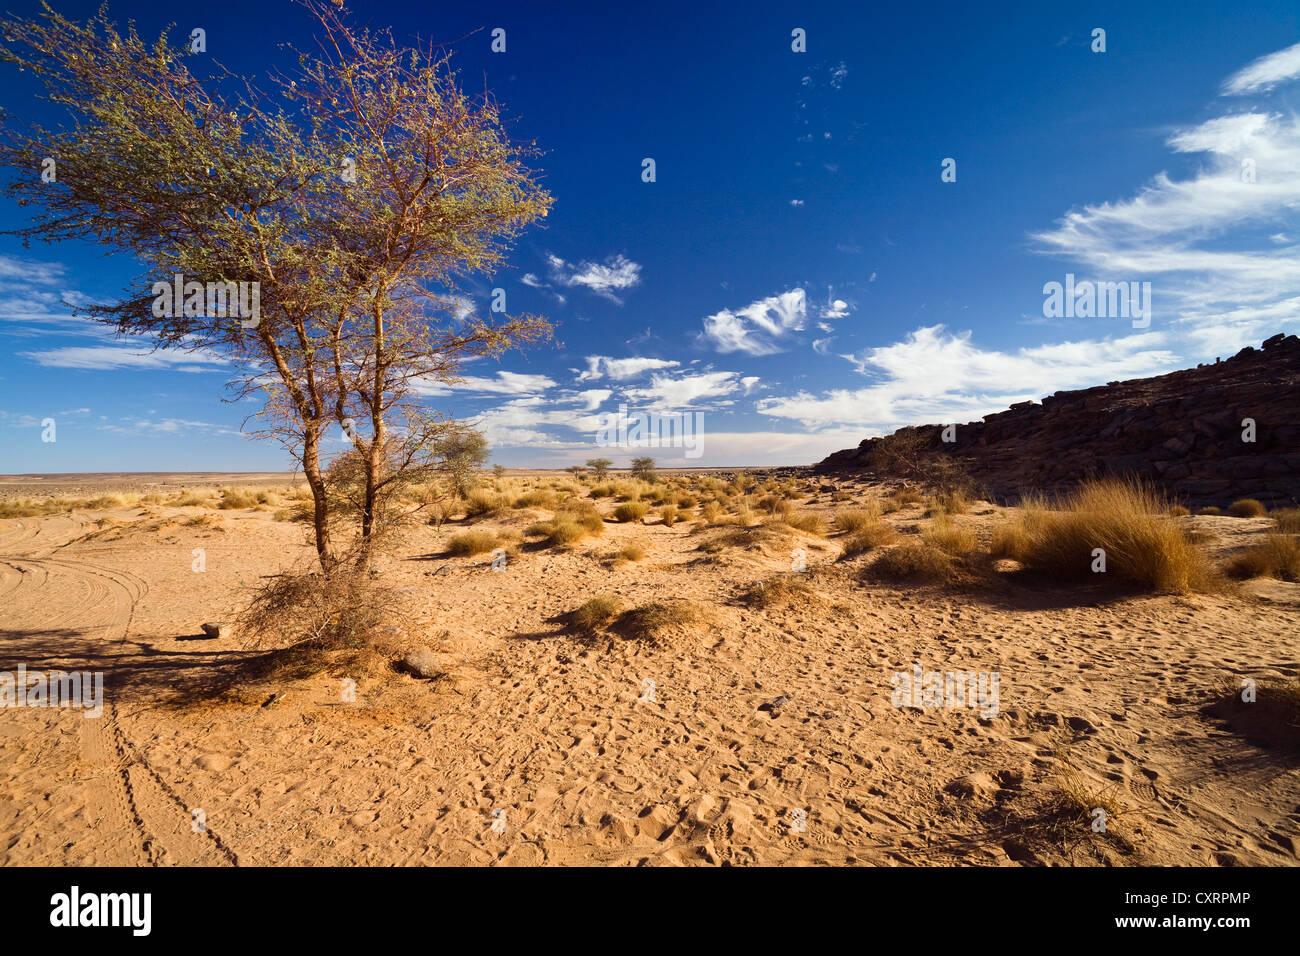 Acacia (Acacia sp.) in a stony desert, Libya, Africa - Stock Image